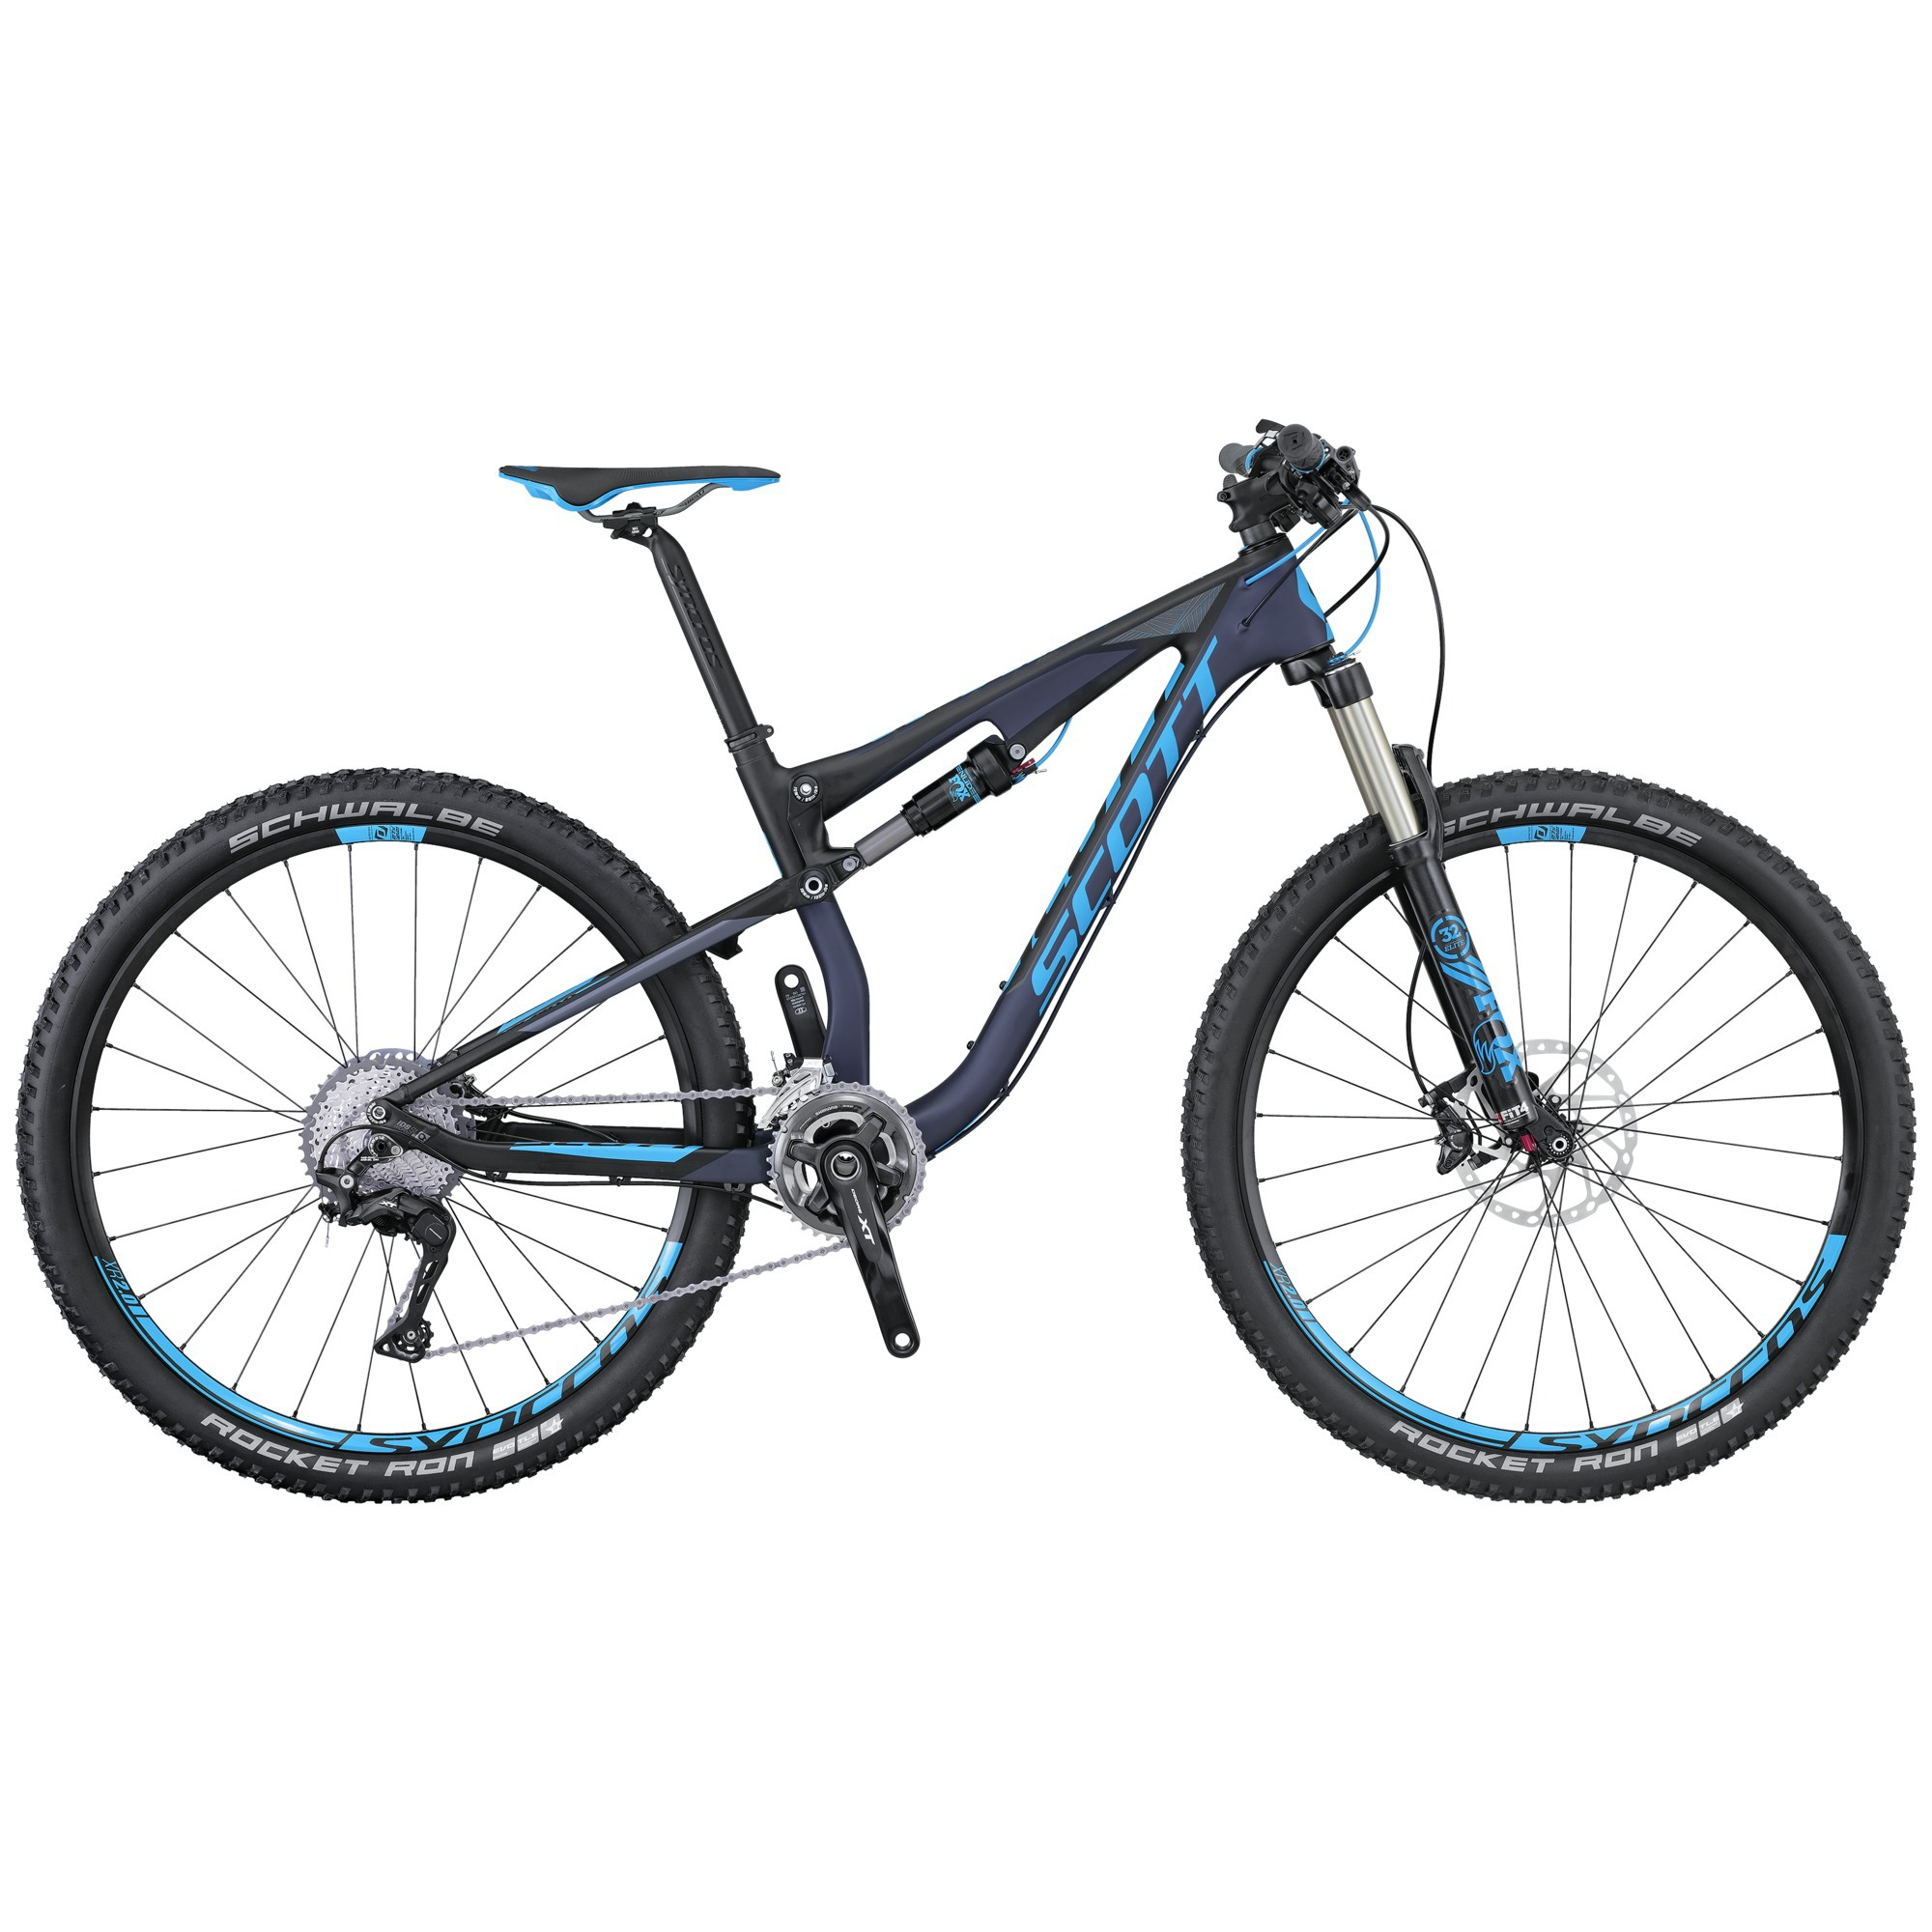 Scott Contessa Spark 700 RC (2016)  велосипед scott contessa spark 700 2016